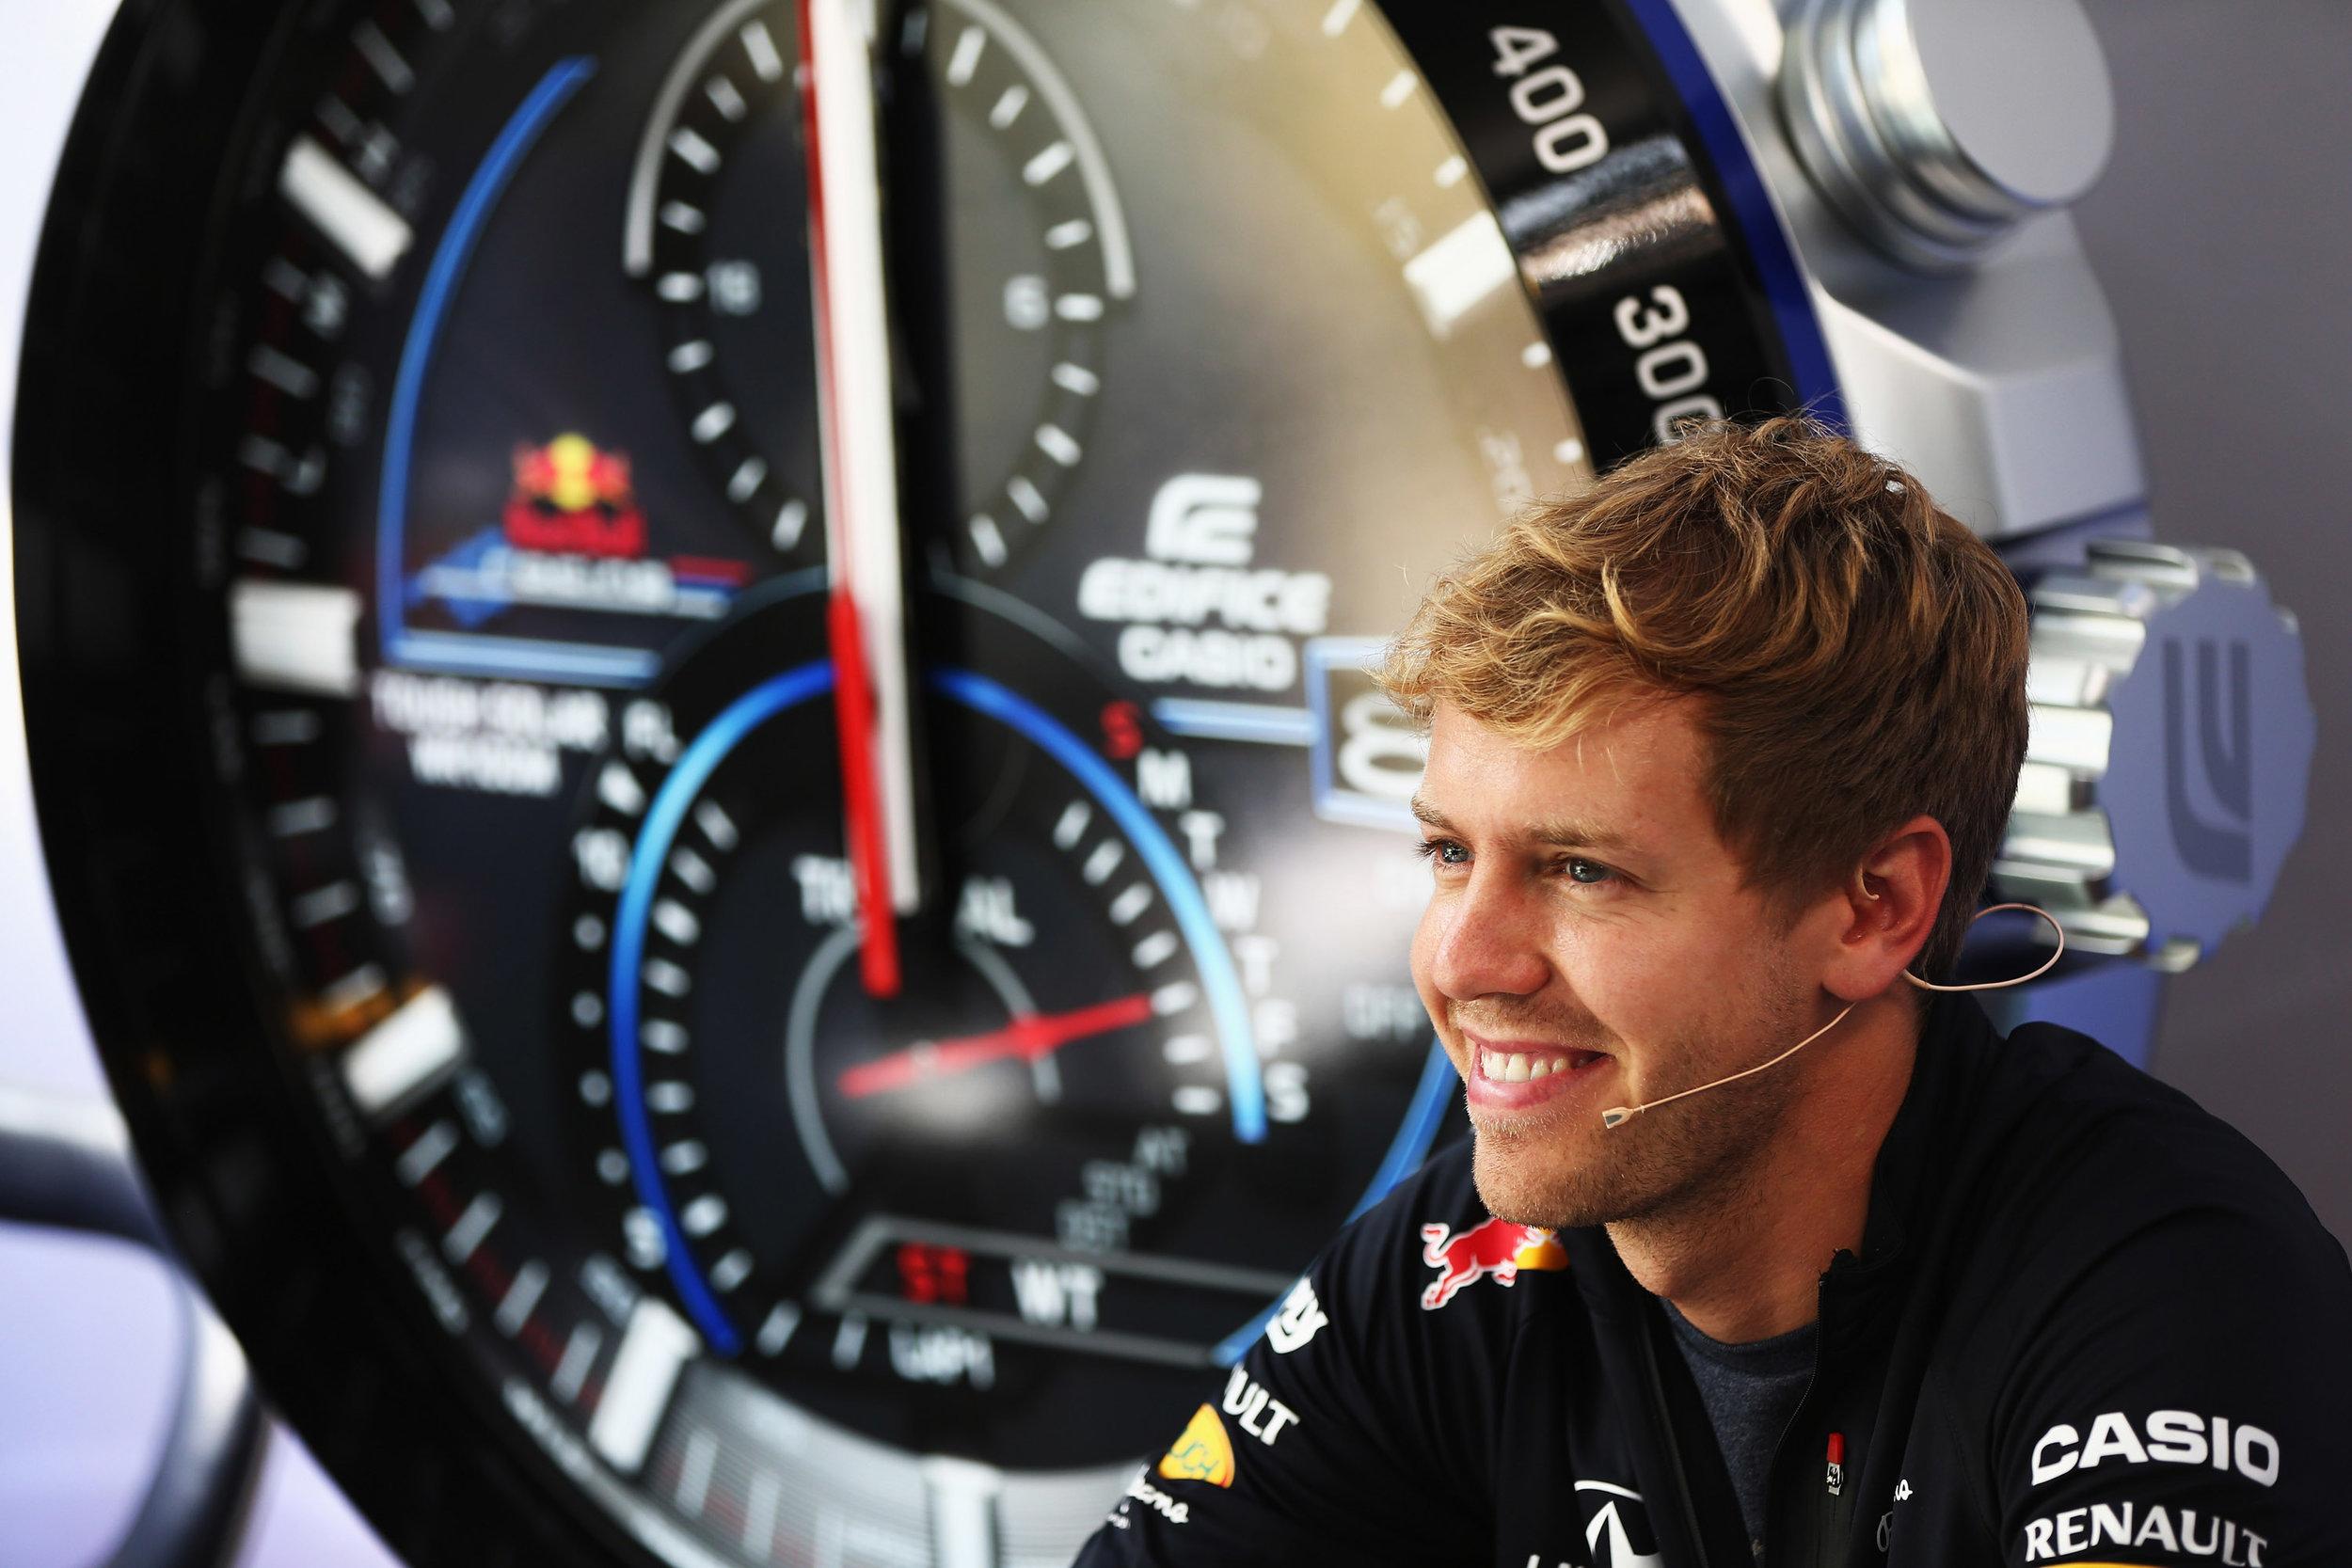 Vettel-with-Casio-edifice-watch-launch.jpg